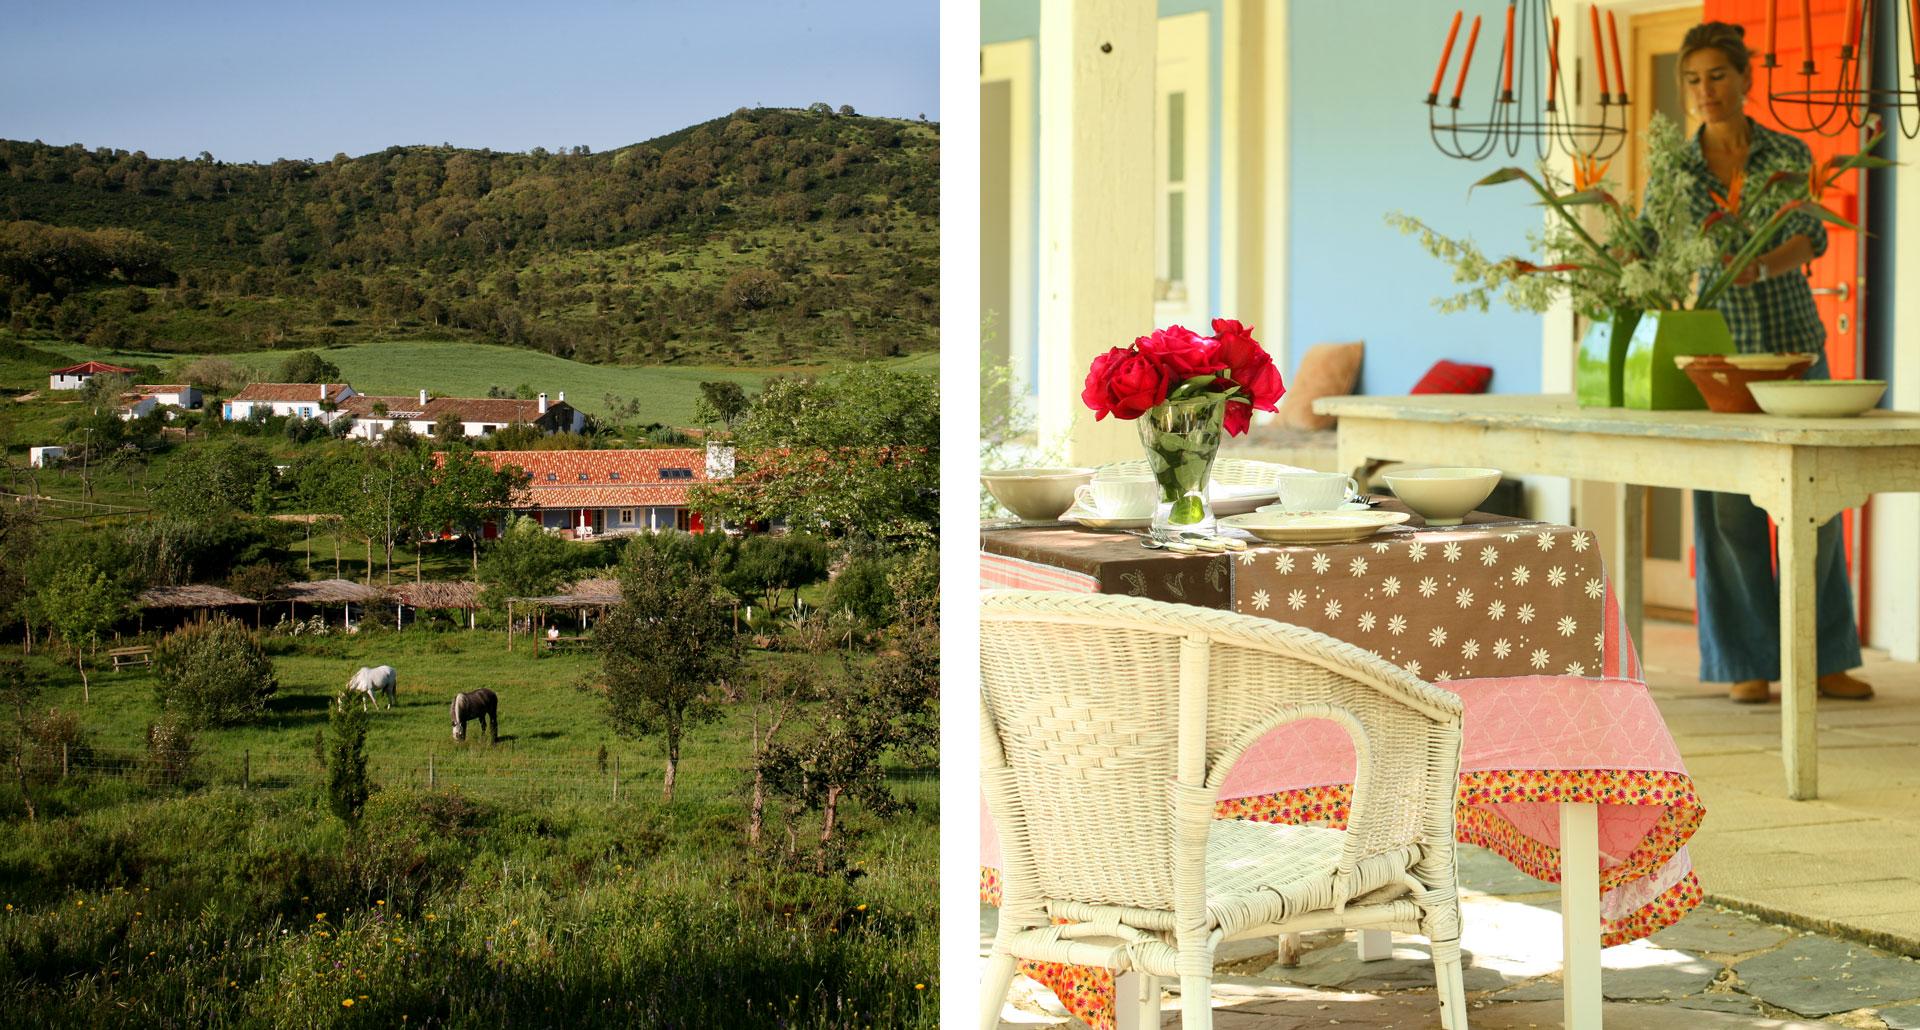 Herdade Da Matinha - boutique hotel in Cercal